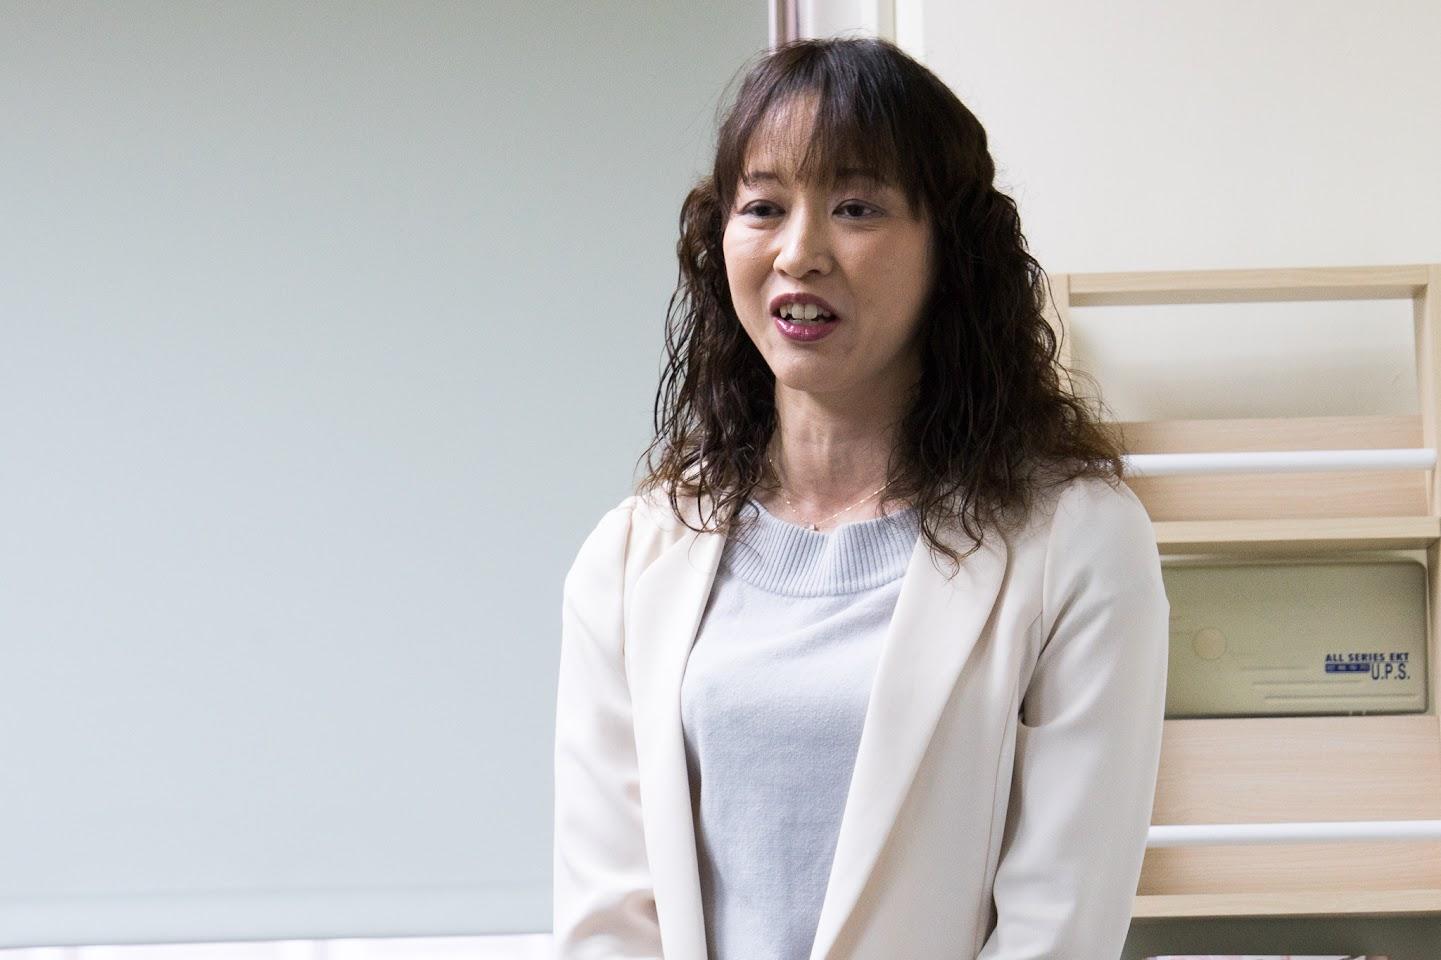 (公財)北海道観光振興機構 事業企画推進部人材育成 サービス向上グループ・梶川郁子 リーダー